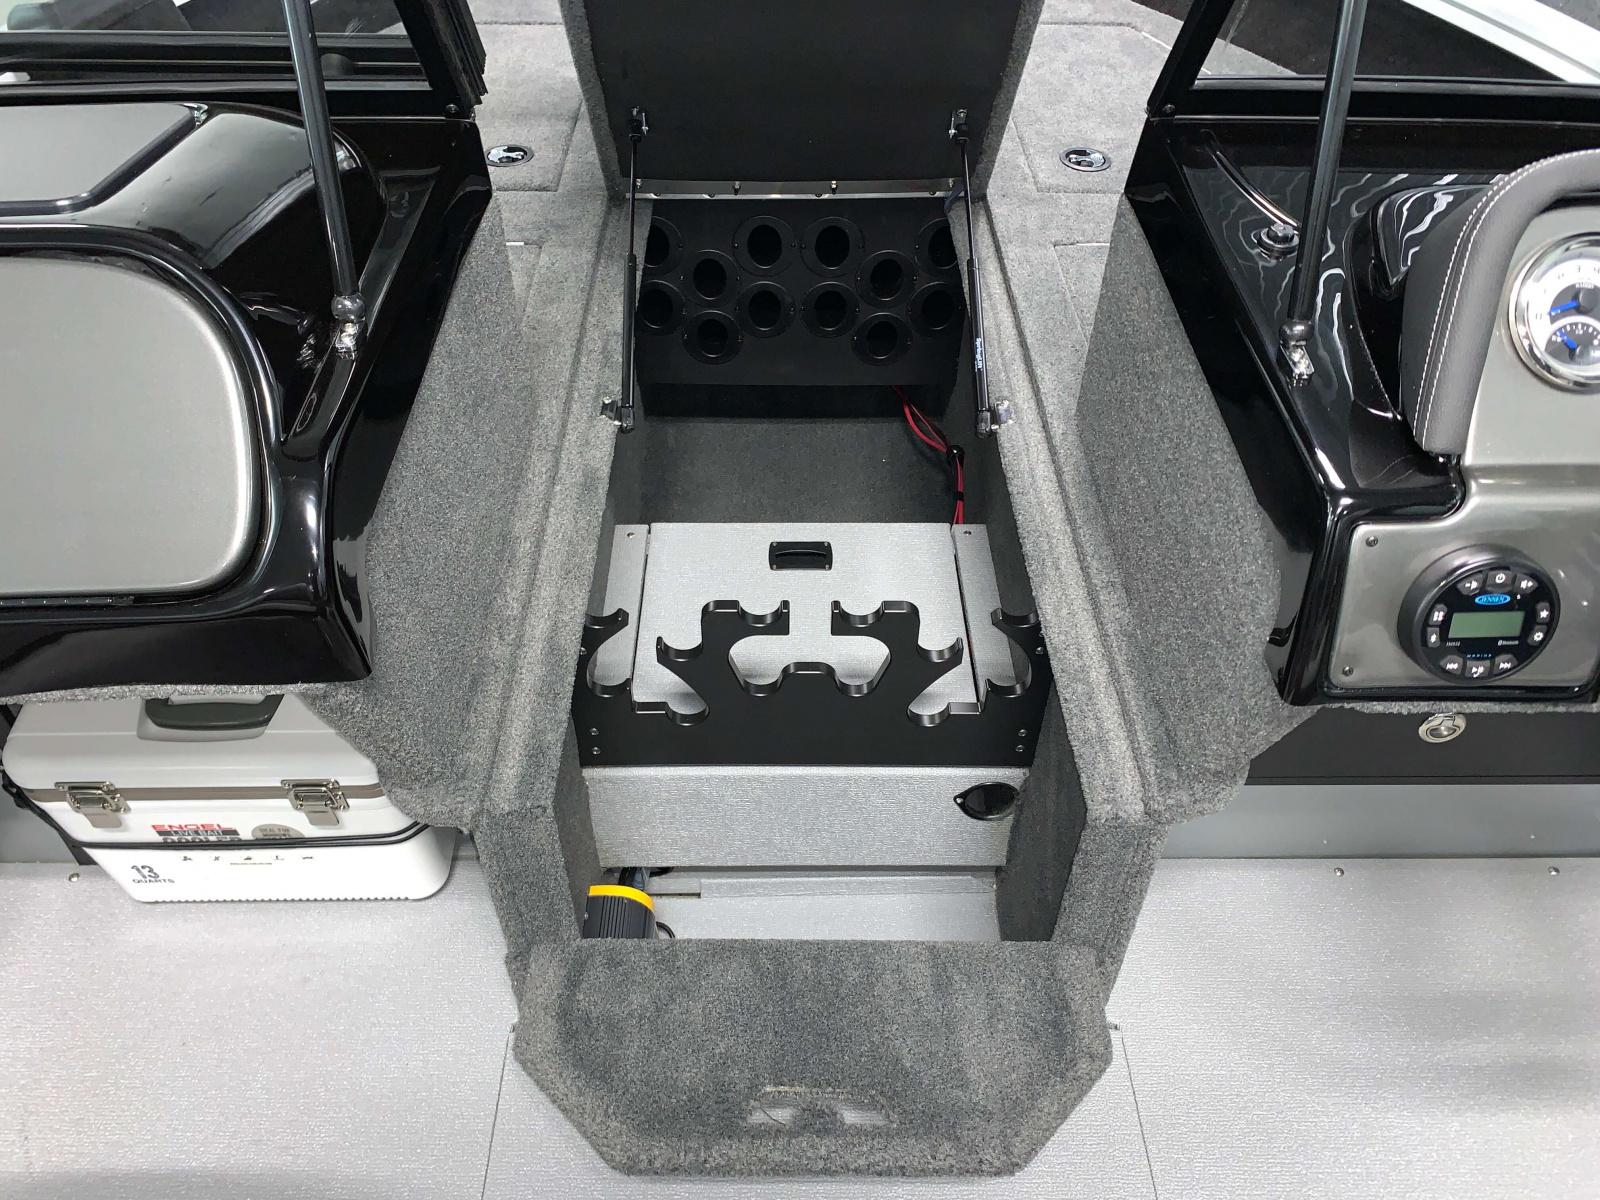 Rod Storage of the 2022 Smoker Craft Adventurer 188 DC Fishing Boat